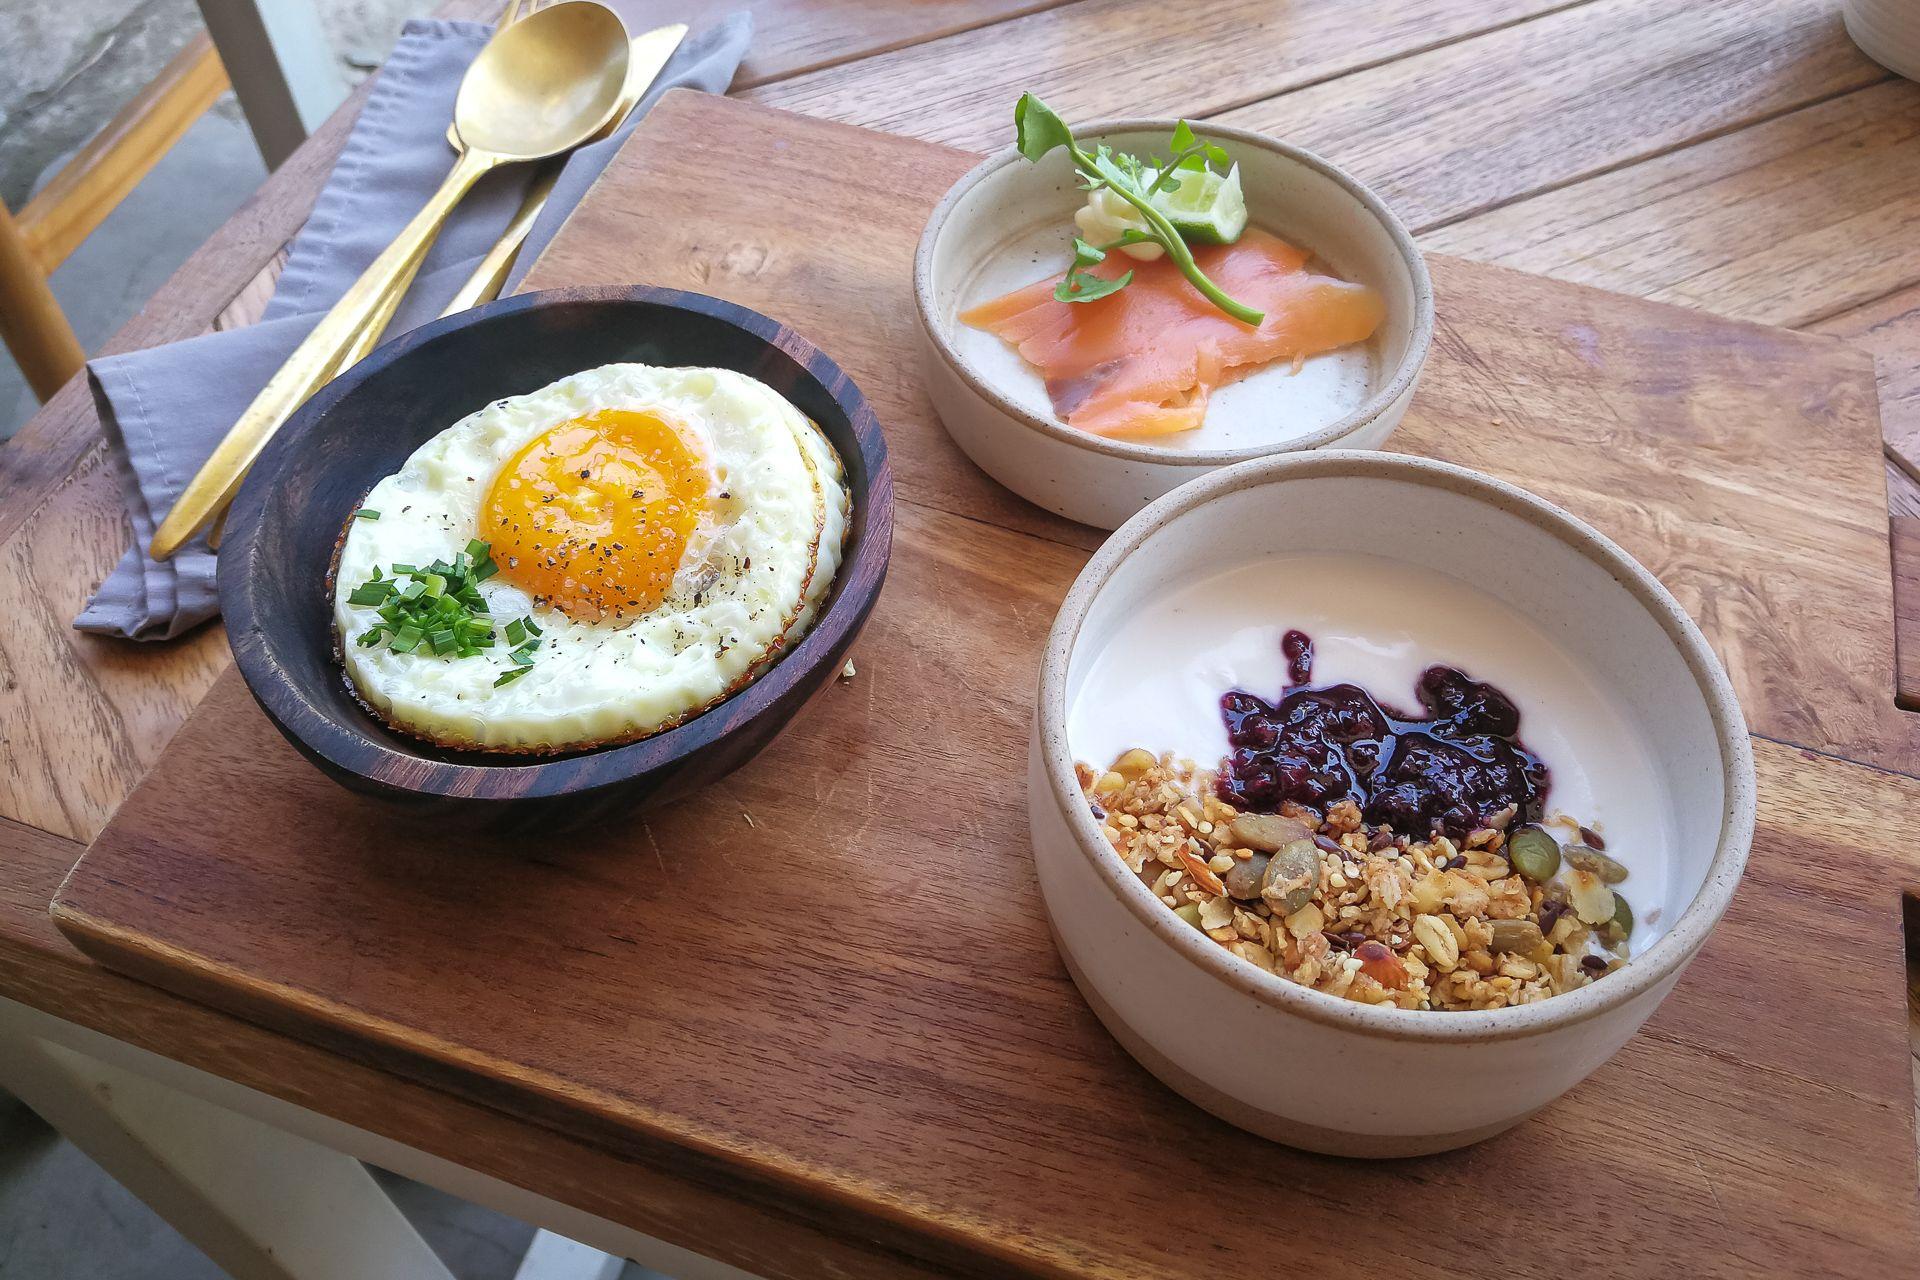 Bali, price Bali, cafe Bali, Бали, цены на Бали, цены на еду в кафе на бали, кафе на Бали, скольк остоит завтрак на Бали, цены в ресторанах Бали, сколько стоит обед на Бали, сколько стоит ужин на Бали, сколько стоит еда на Бали